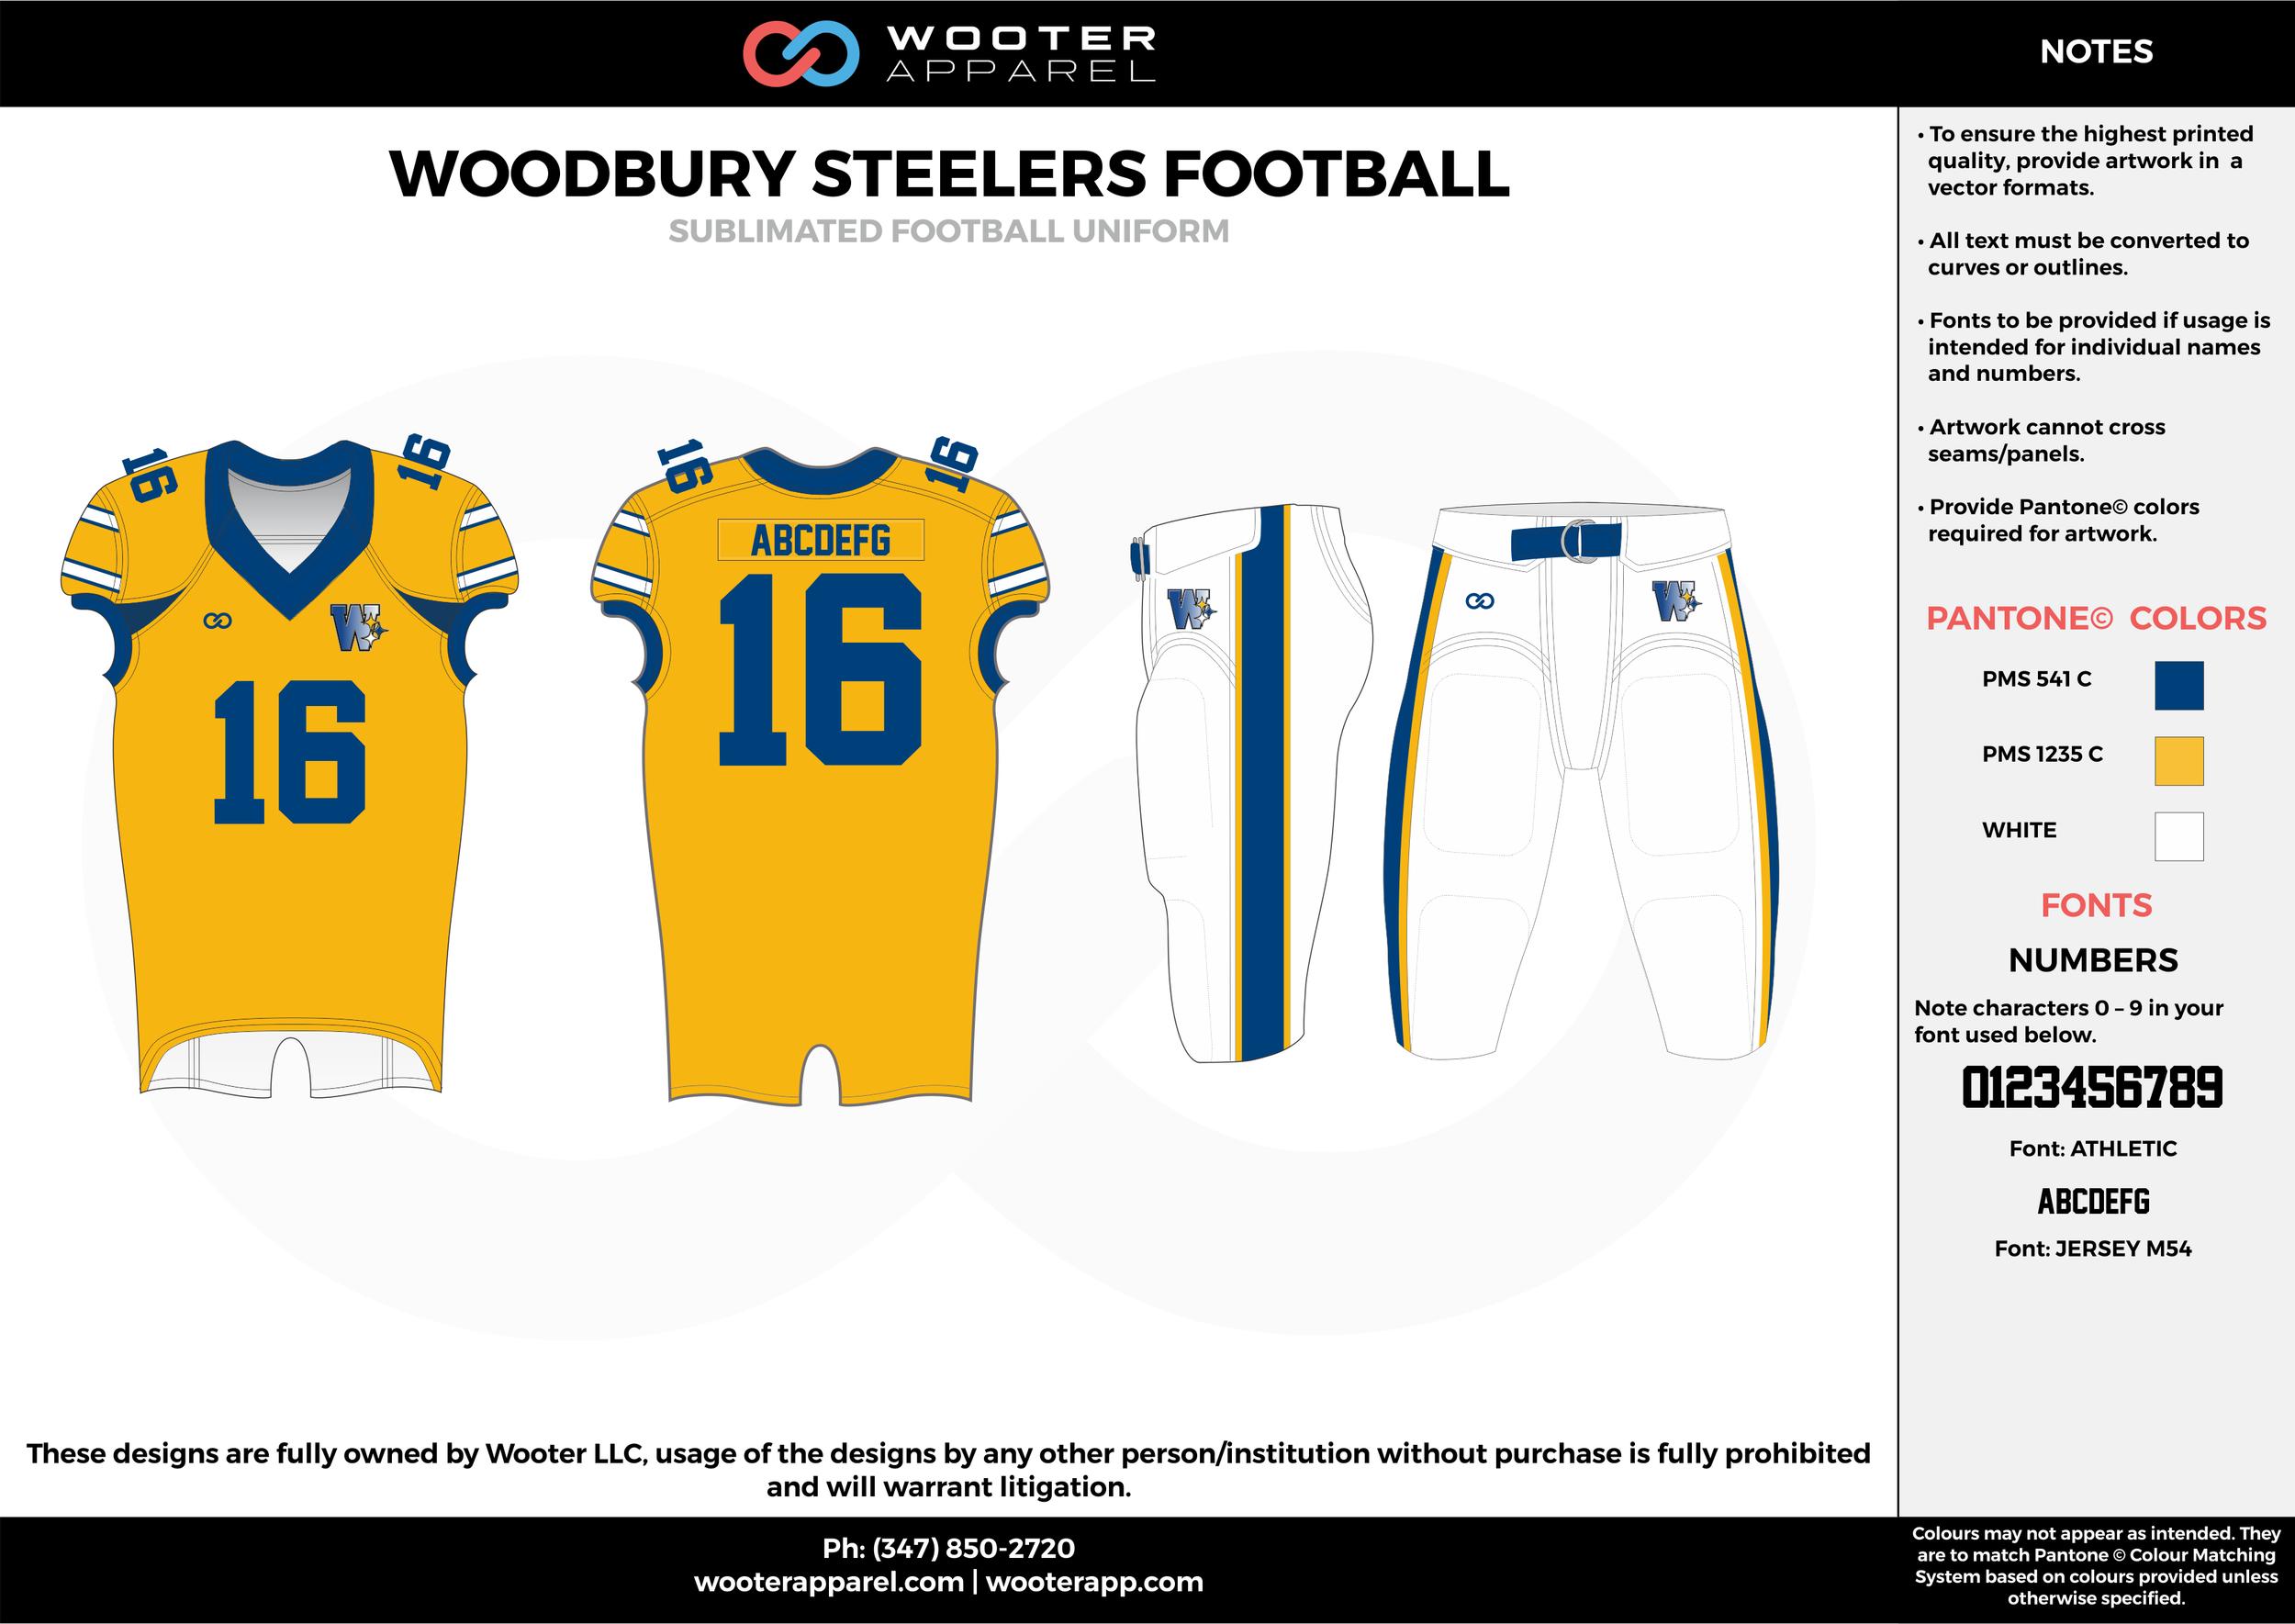 WOODBURY STEELERS FOOTBALL yellow blue white football uniforms jerseys pants